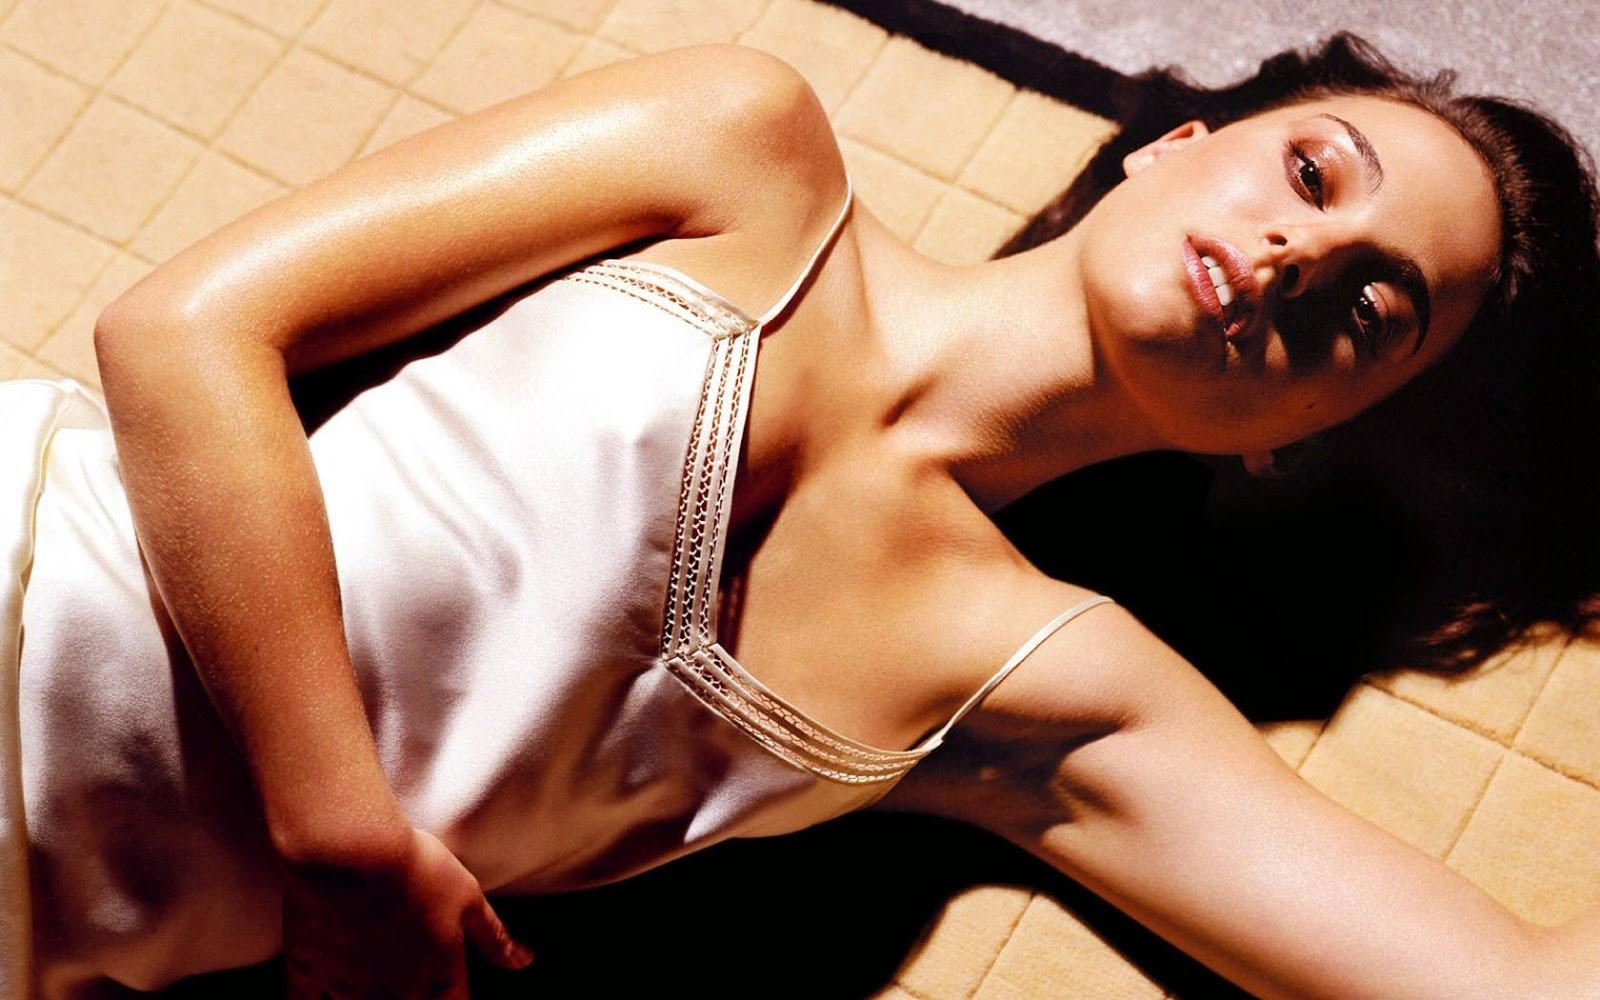 Natalie Portman Hot Photoshoot Pic